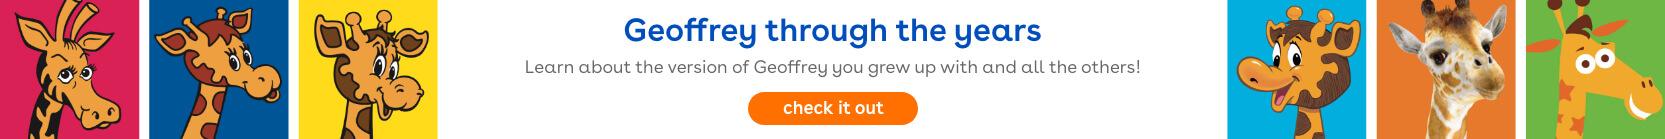 Geoffrey through the years